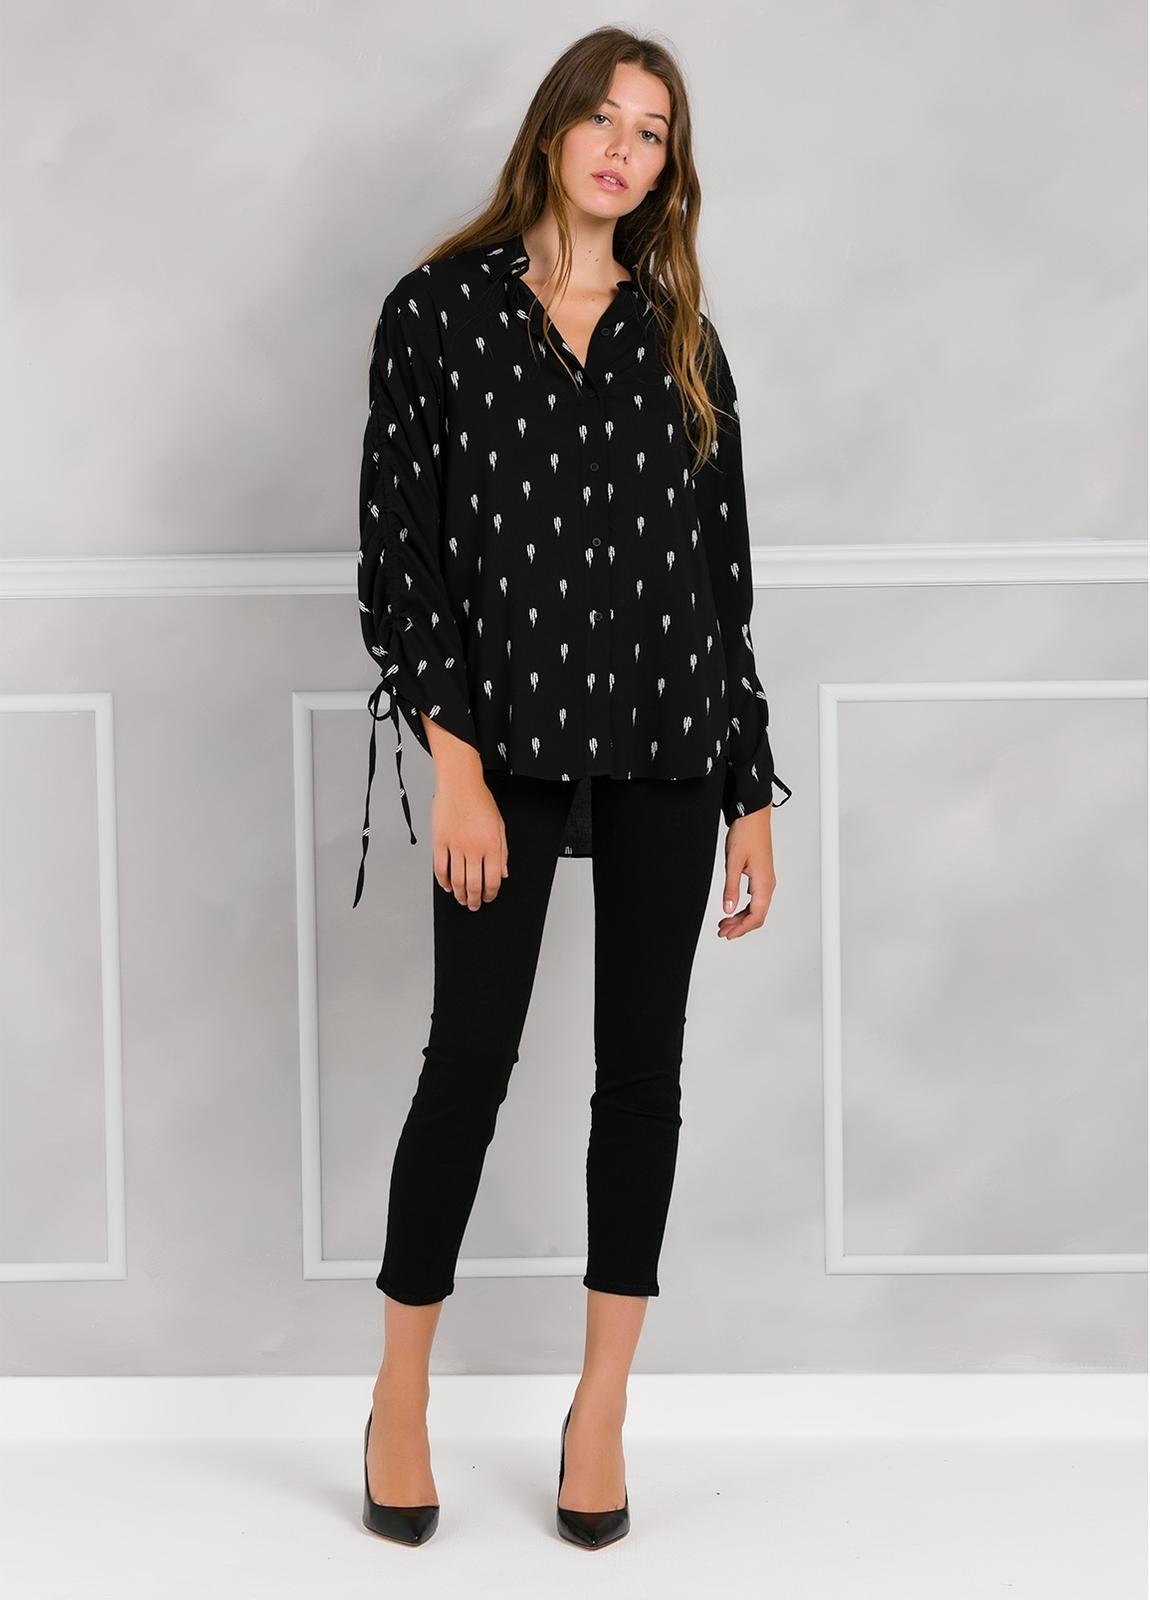 Blusa larga estampada color negro anudada en mangas. - Ítem1